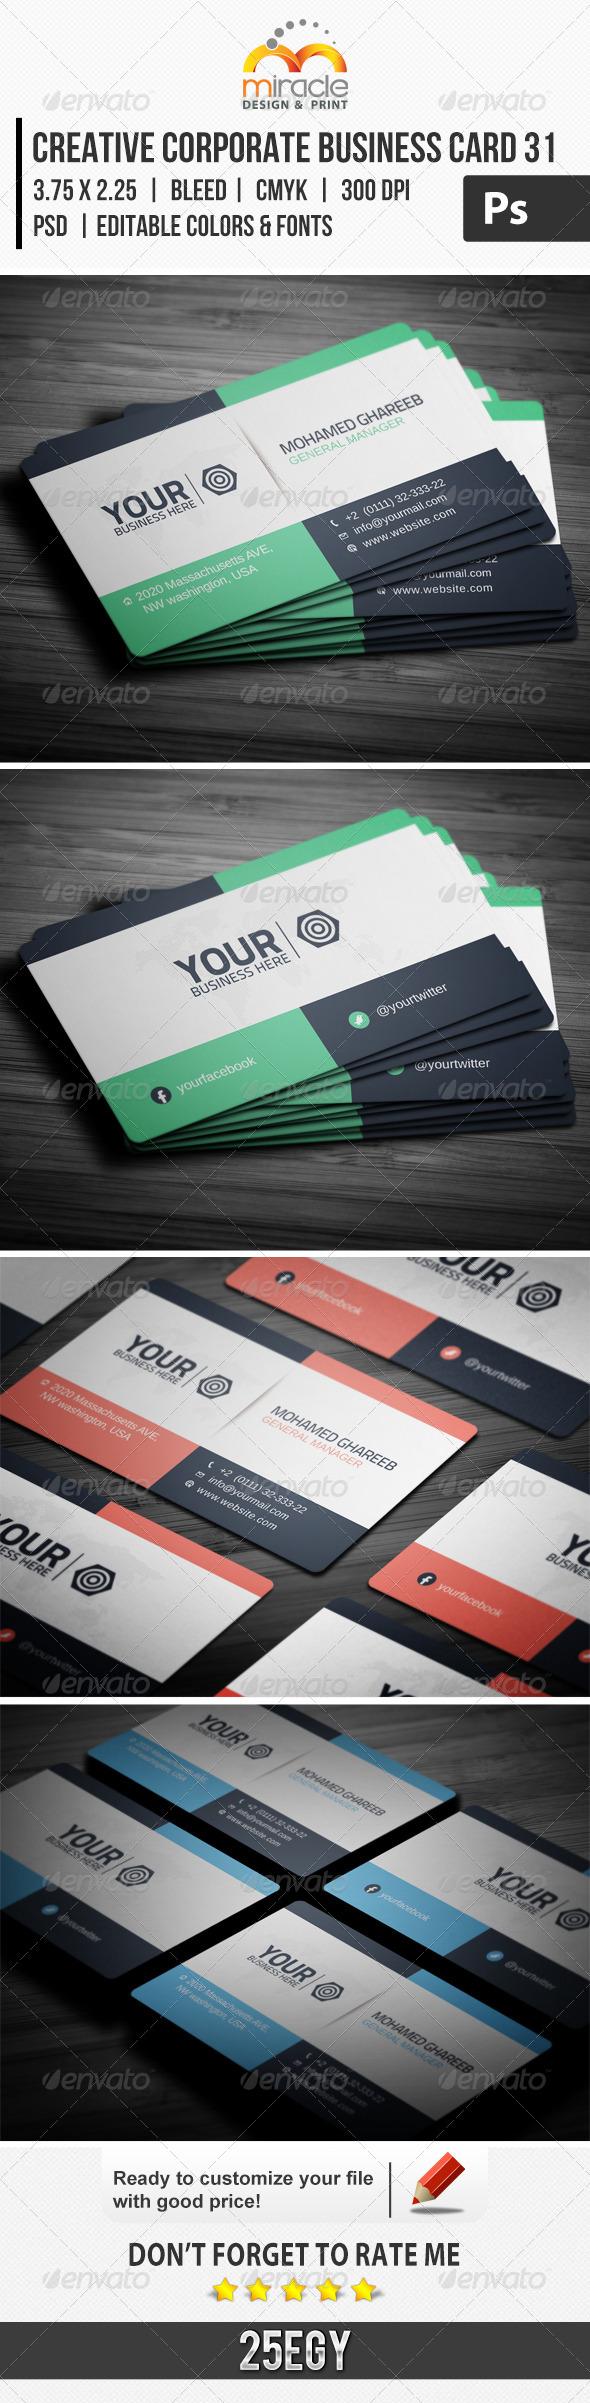 Creative Corporate Business Card 31 - Corporate Business Cards